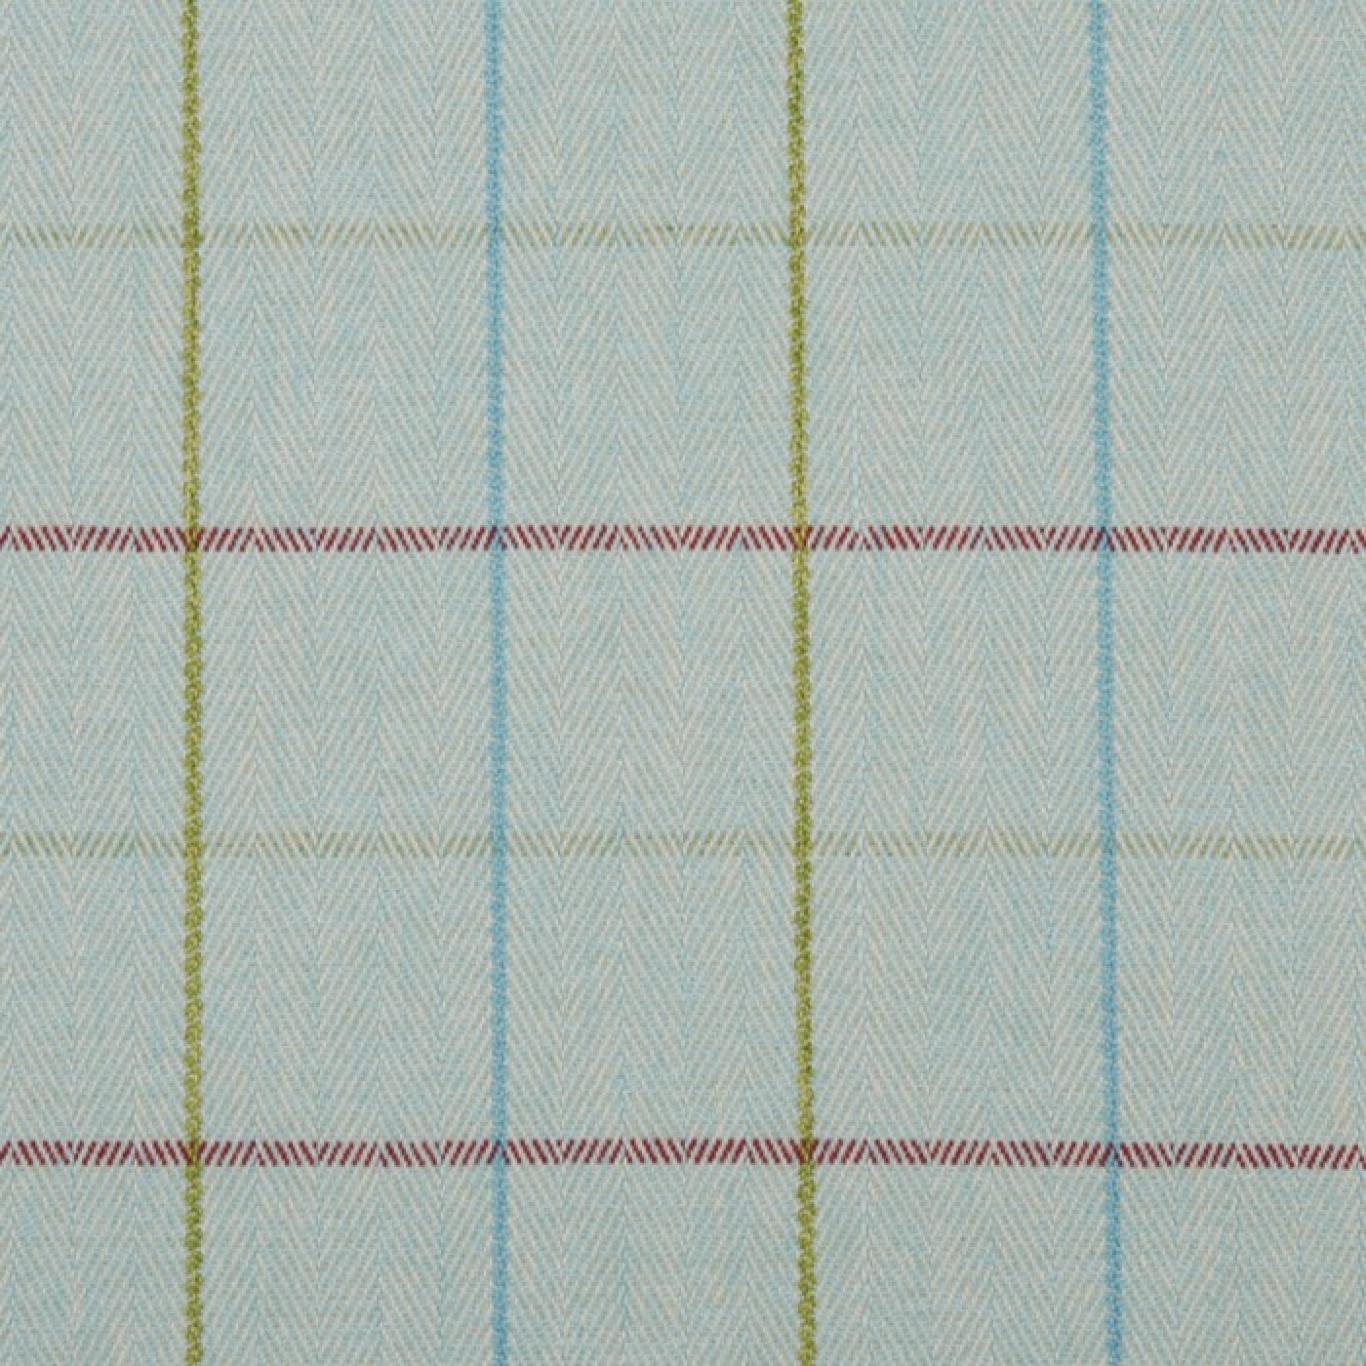 Image of Prestigious Brodie Duck Egg Fabric